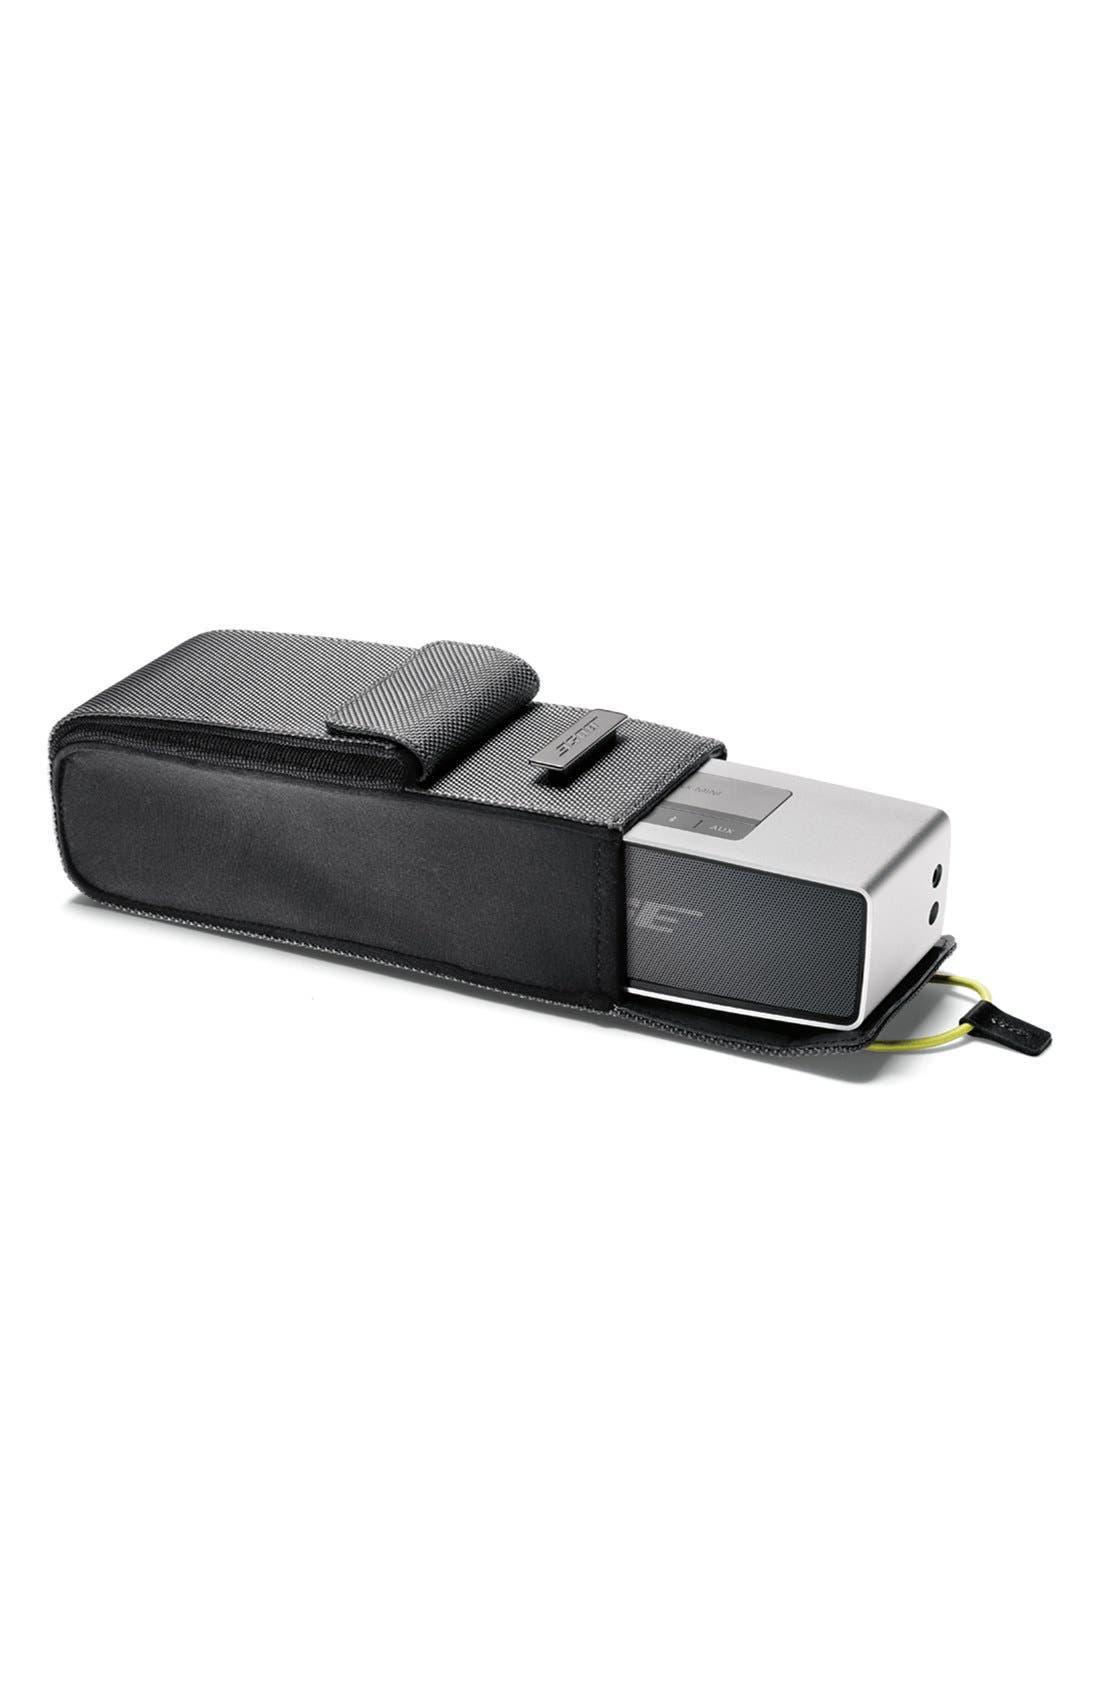 Main Image - Bose® SoundLink® Mini Travel Bag